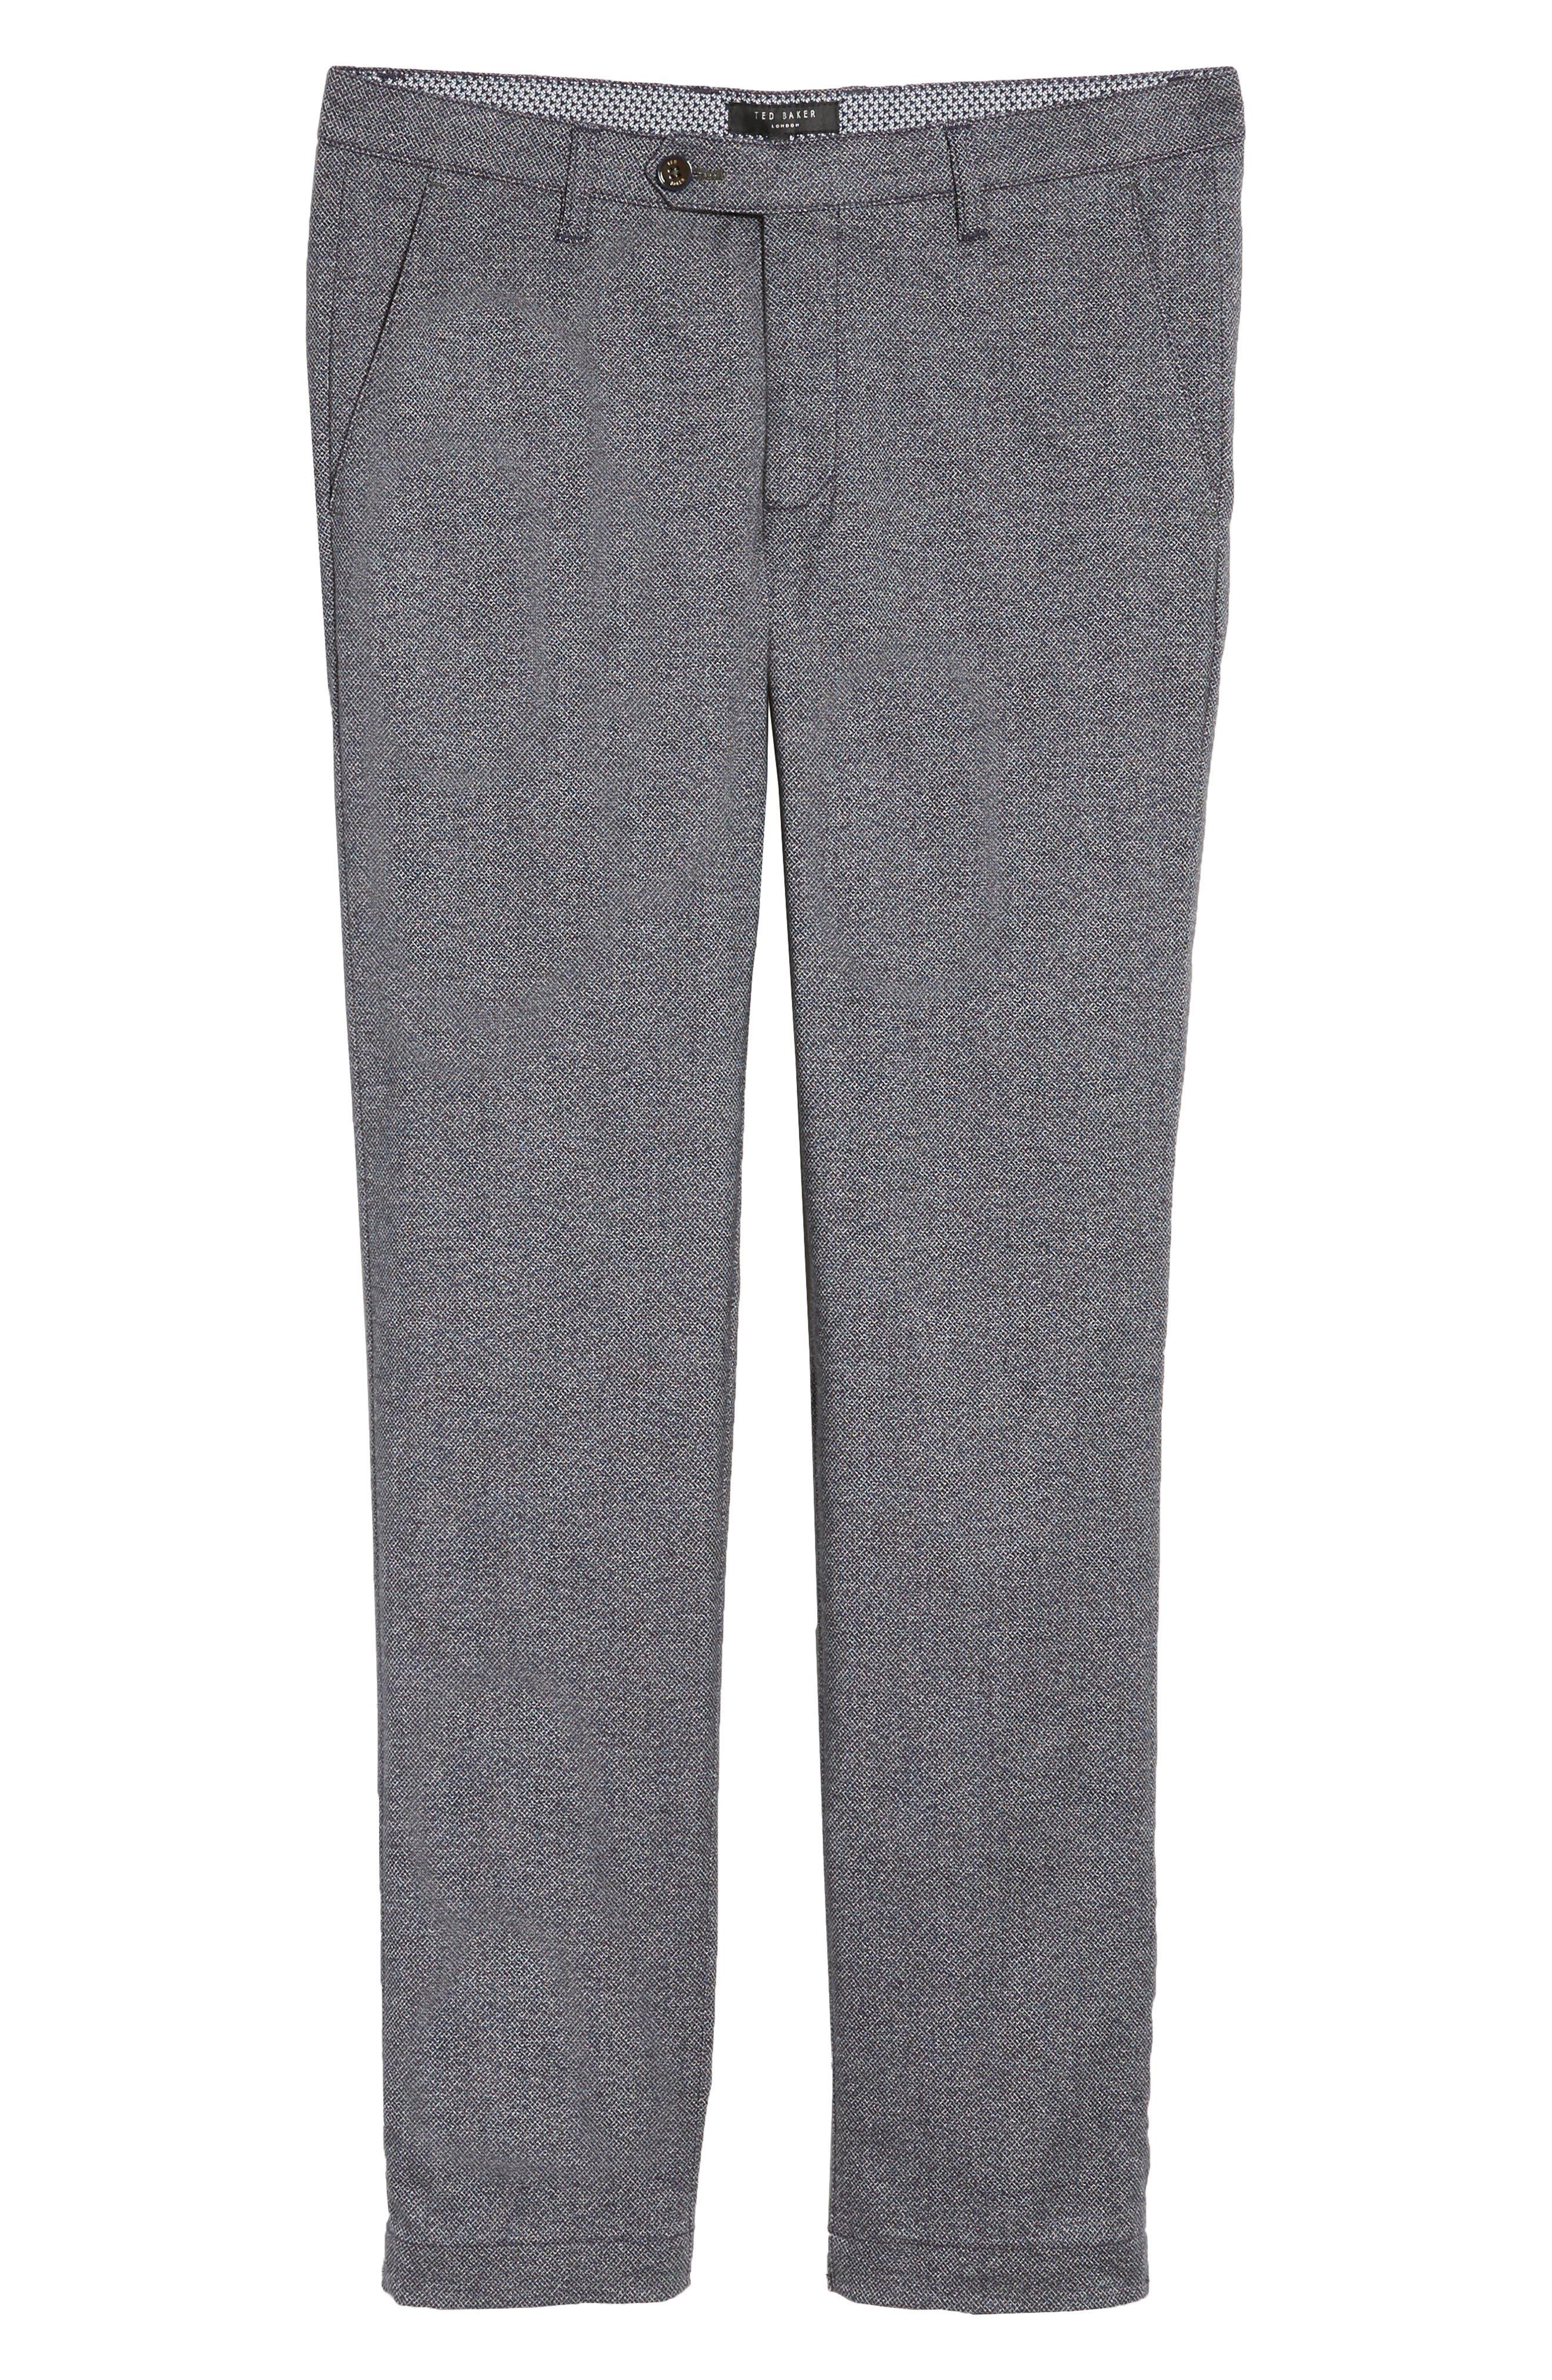 Pintz Slim Fit Trousers,                             Alternate thumbnail 6, color,                             Navy